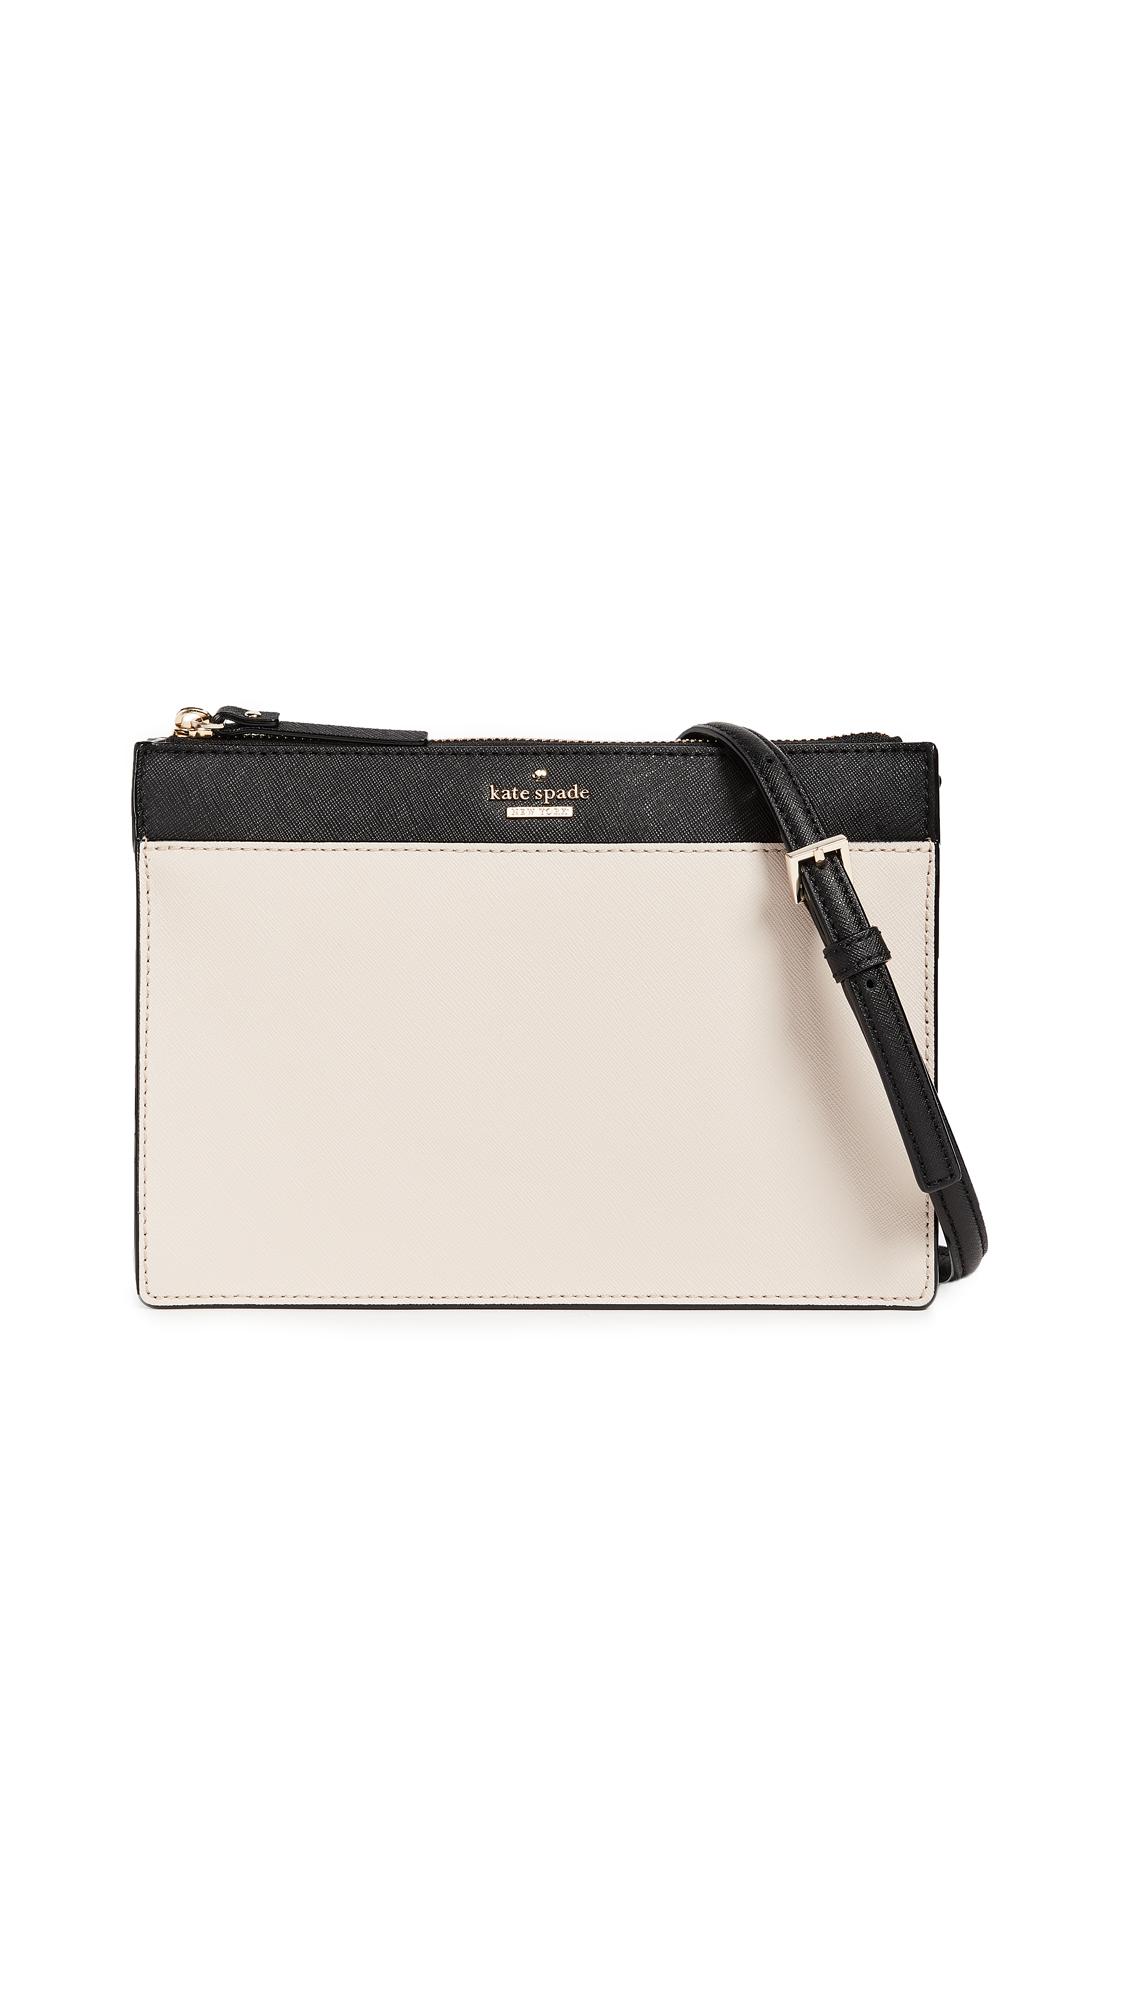 Kate Spade New York Clarise Cross Body Bag - Tusk/Black